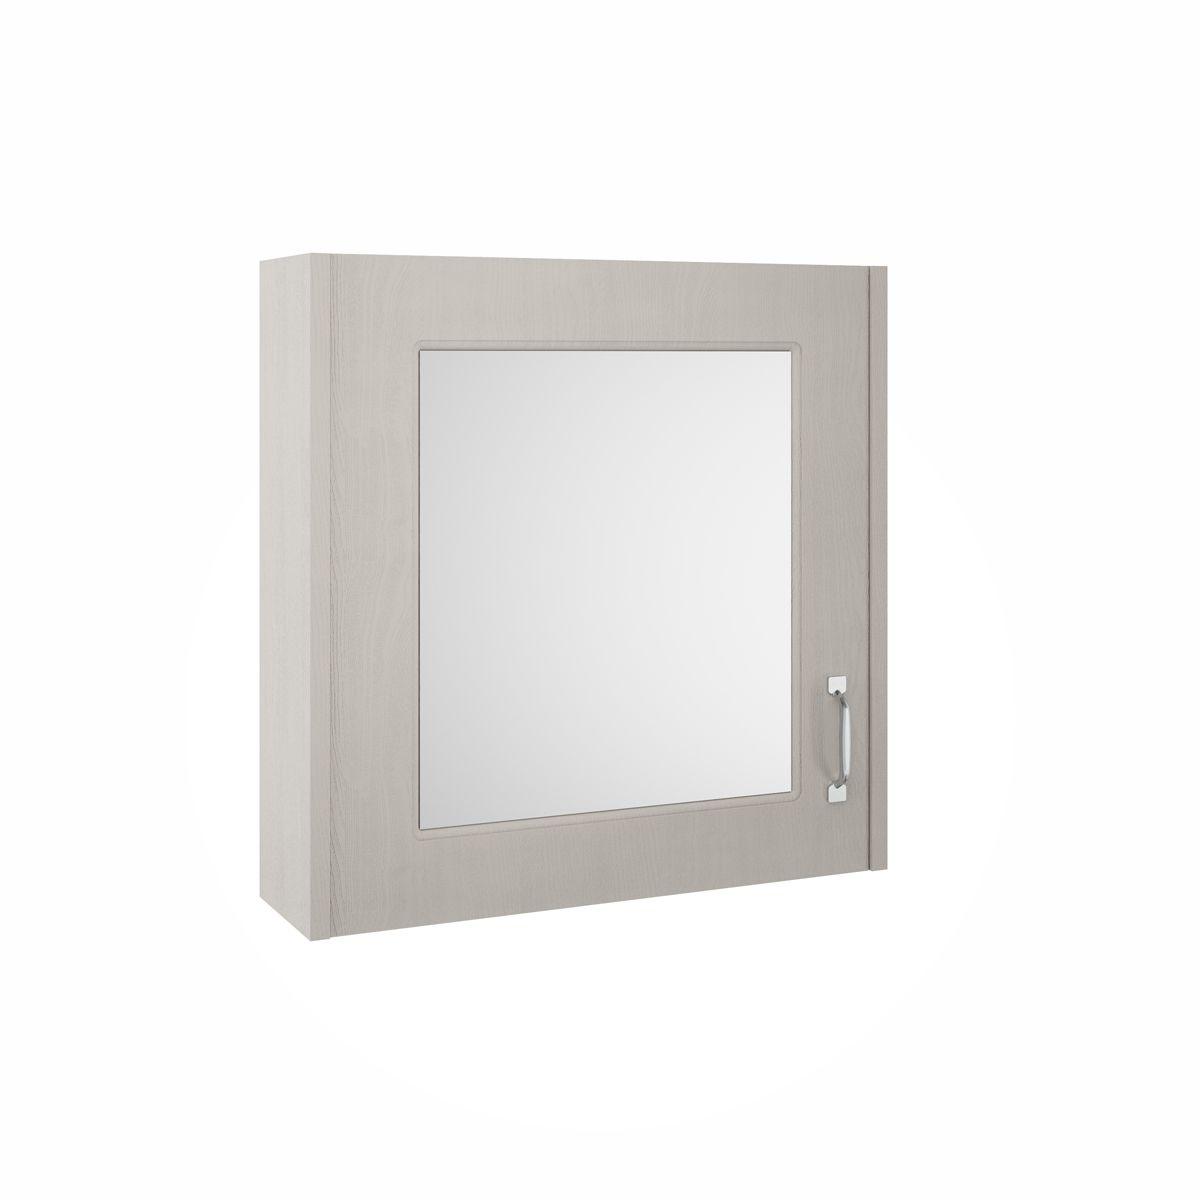 York Traditional Stone Grey Mirror Cabinet 600mm